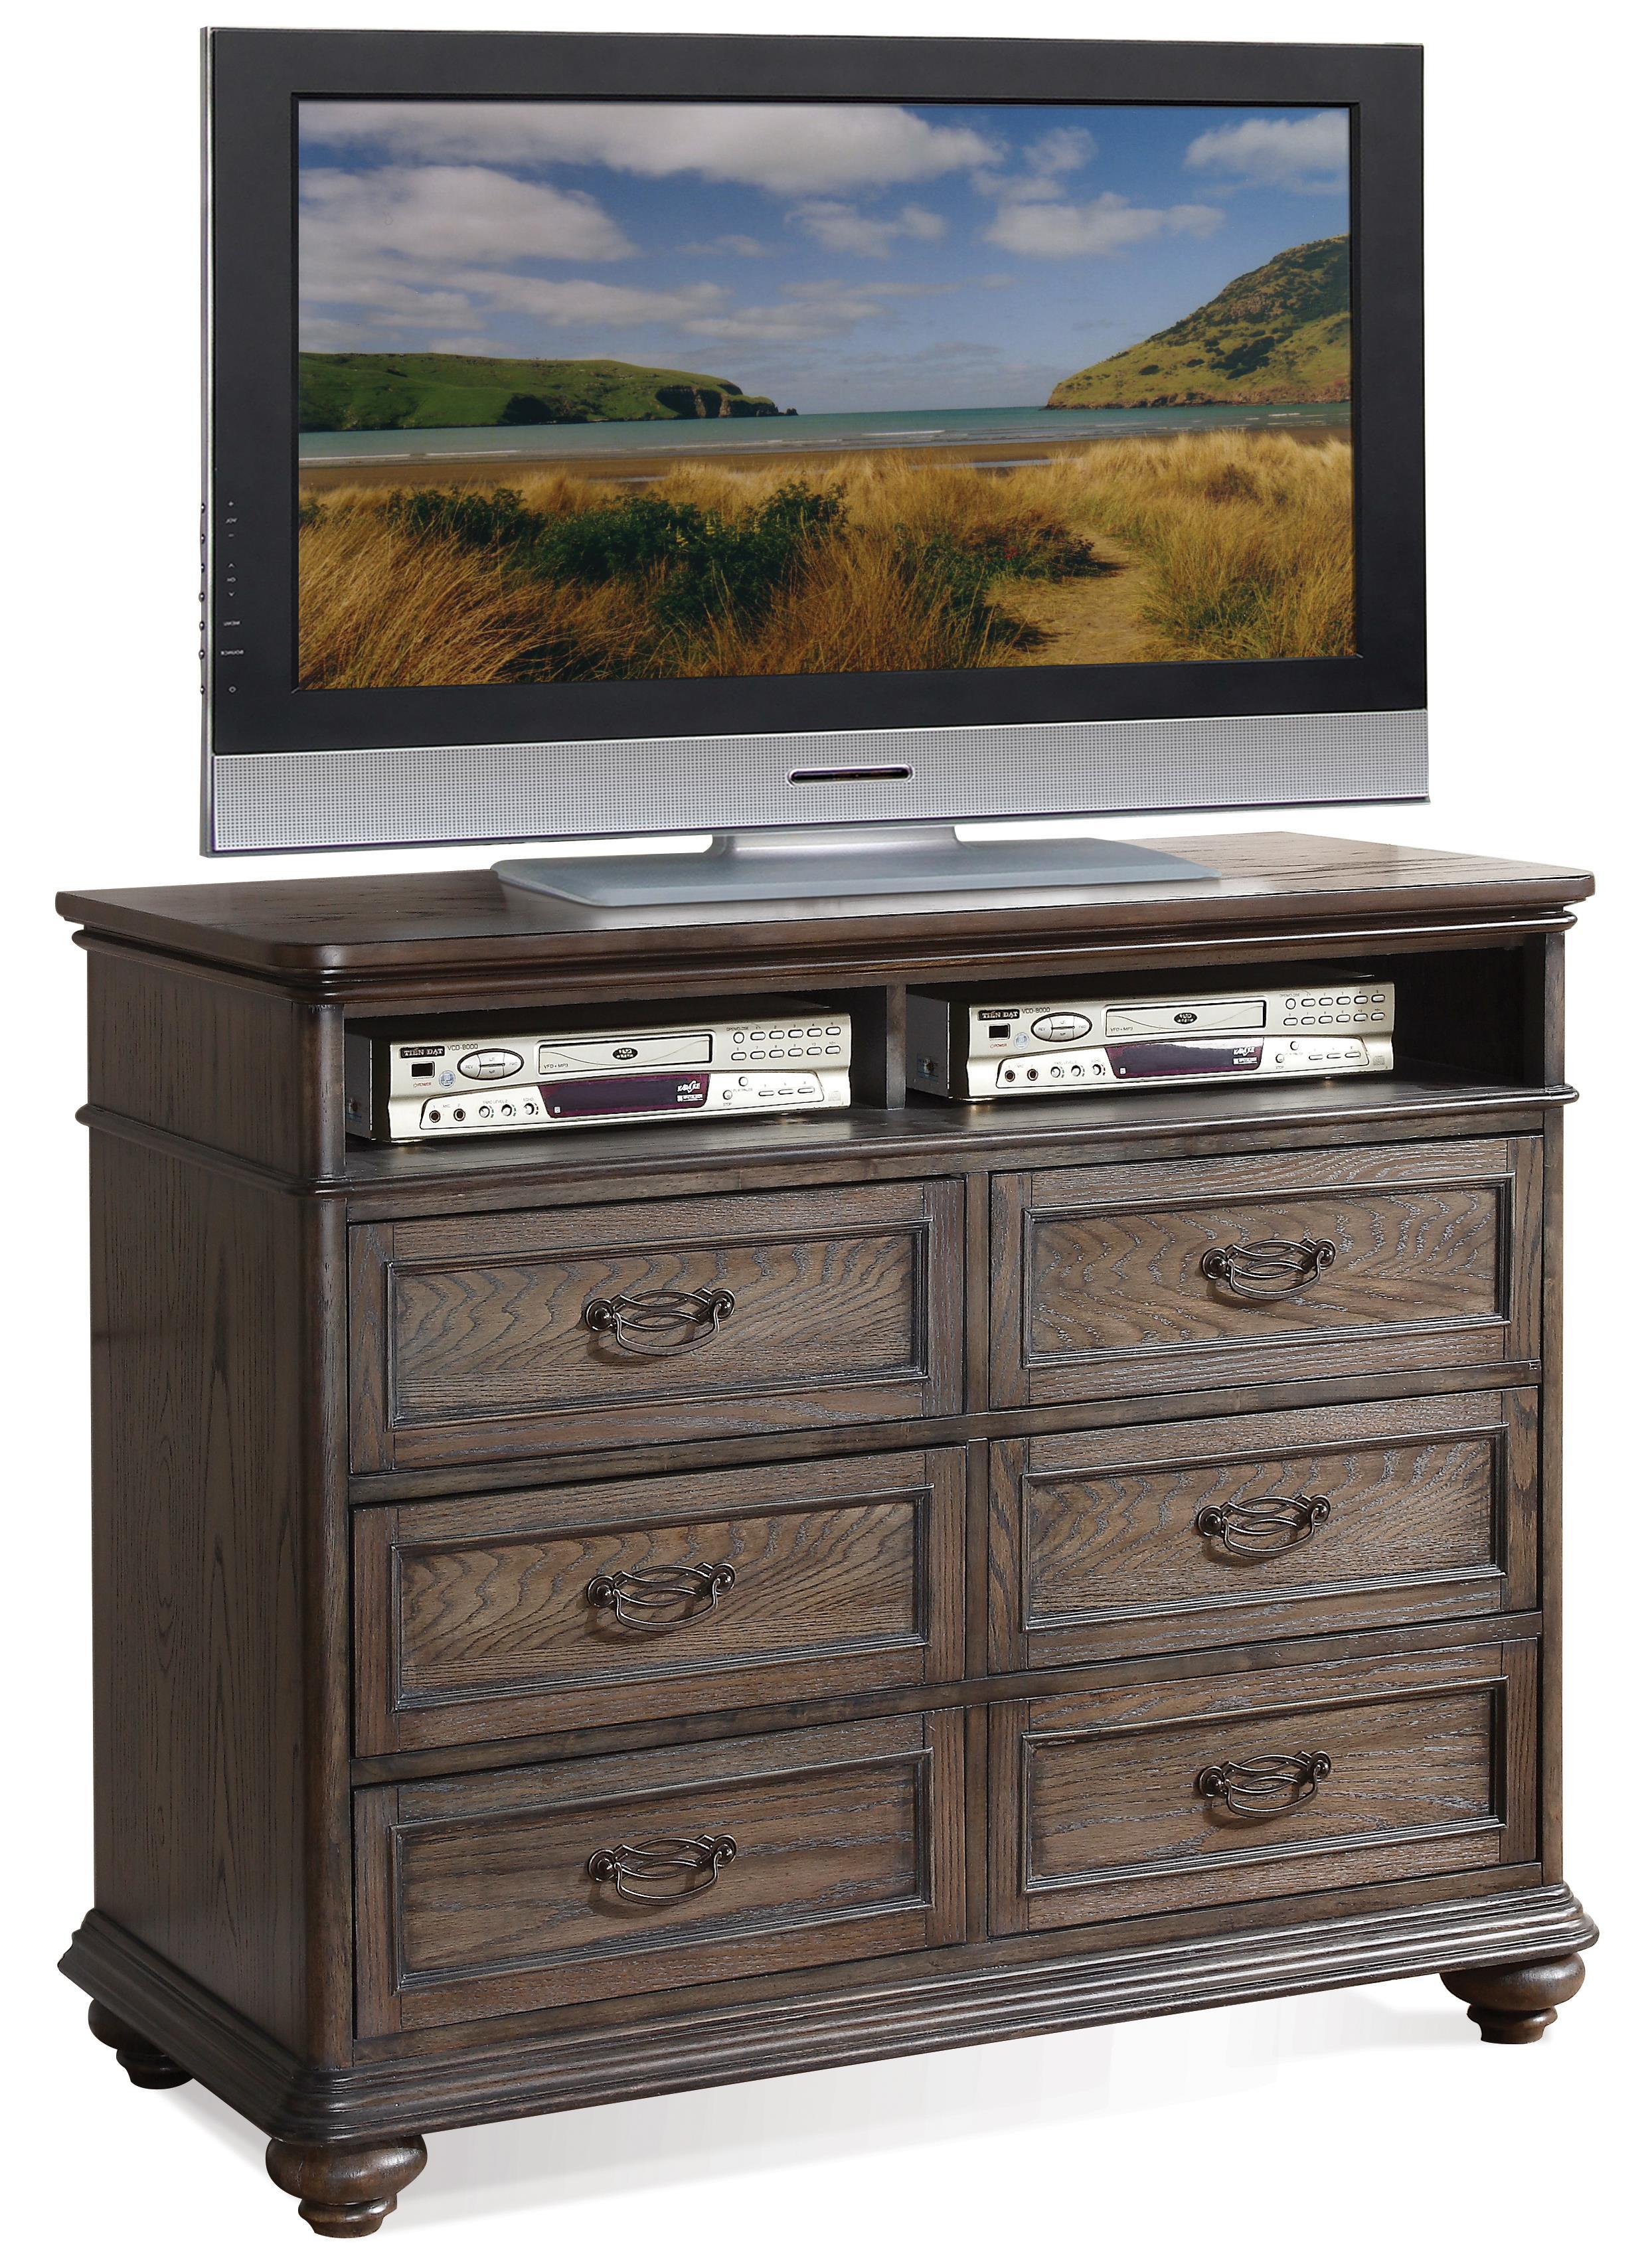 Riverside Furniture Belmeade Entertainment Chest - Item Number: 15864